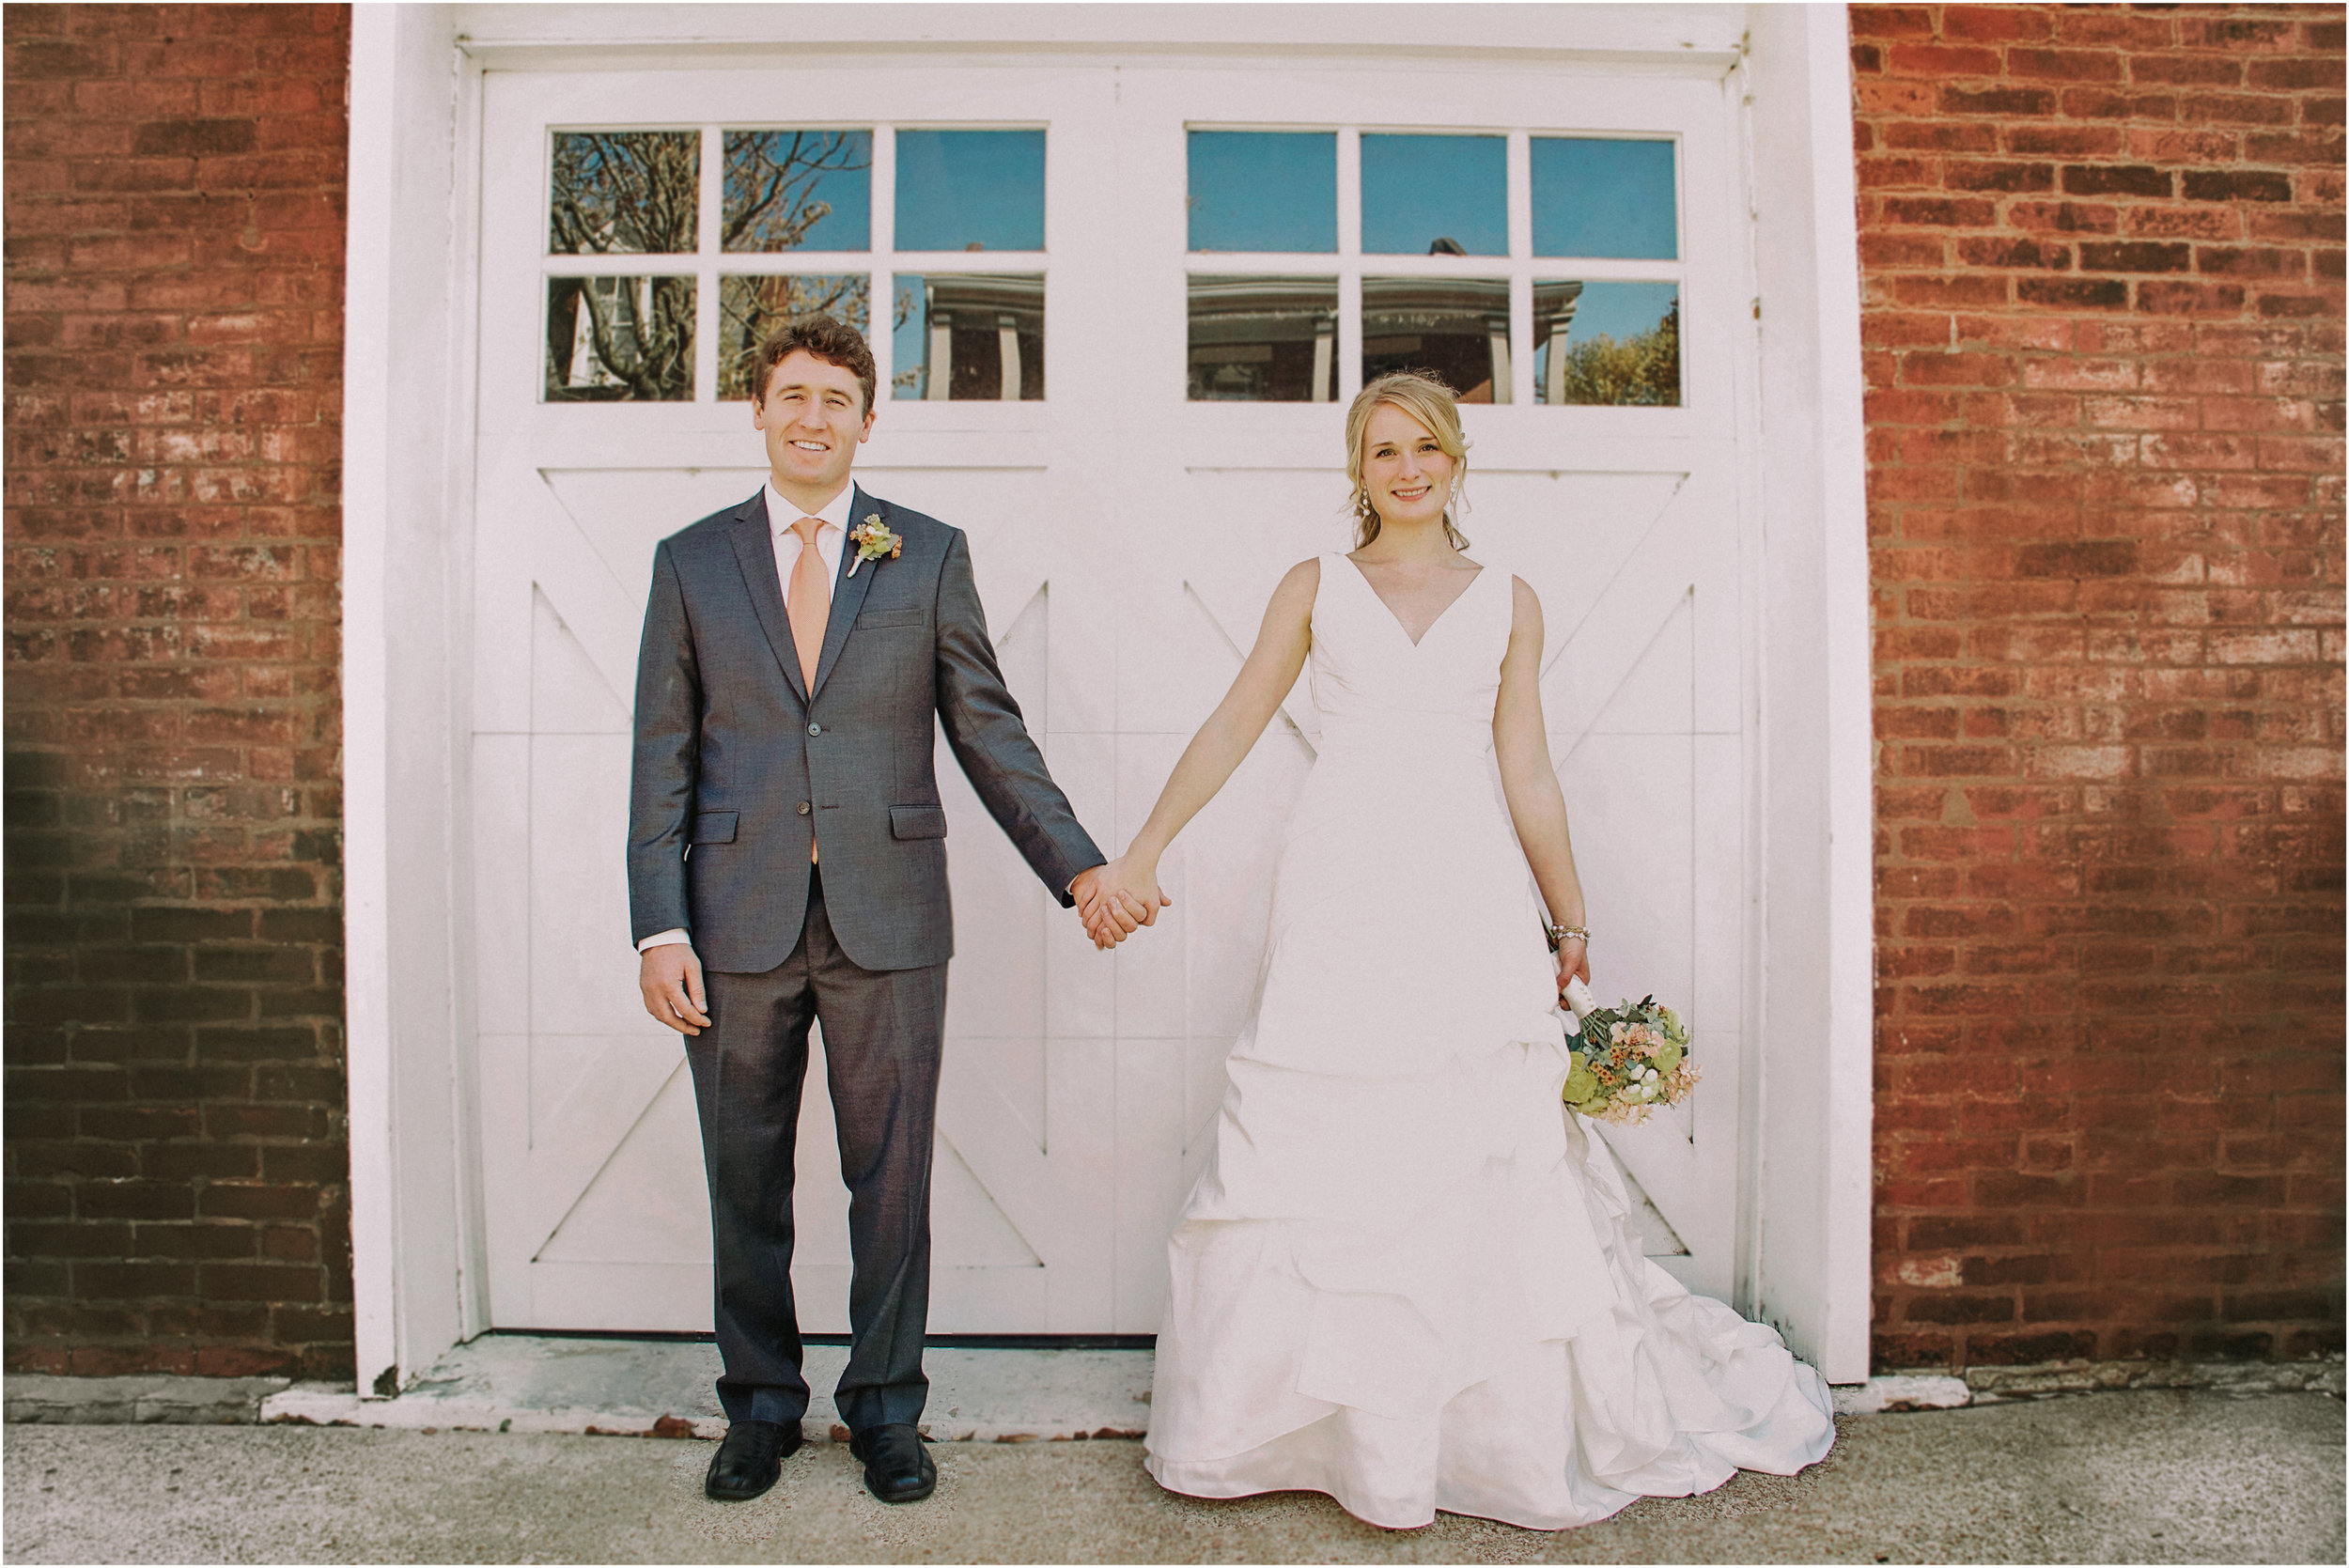 Green Bay Wisconsin Wedding Photographer 5.jpg